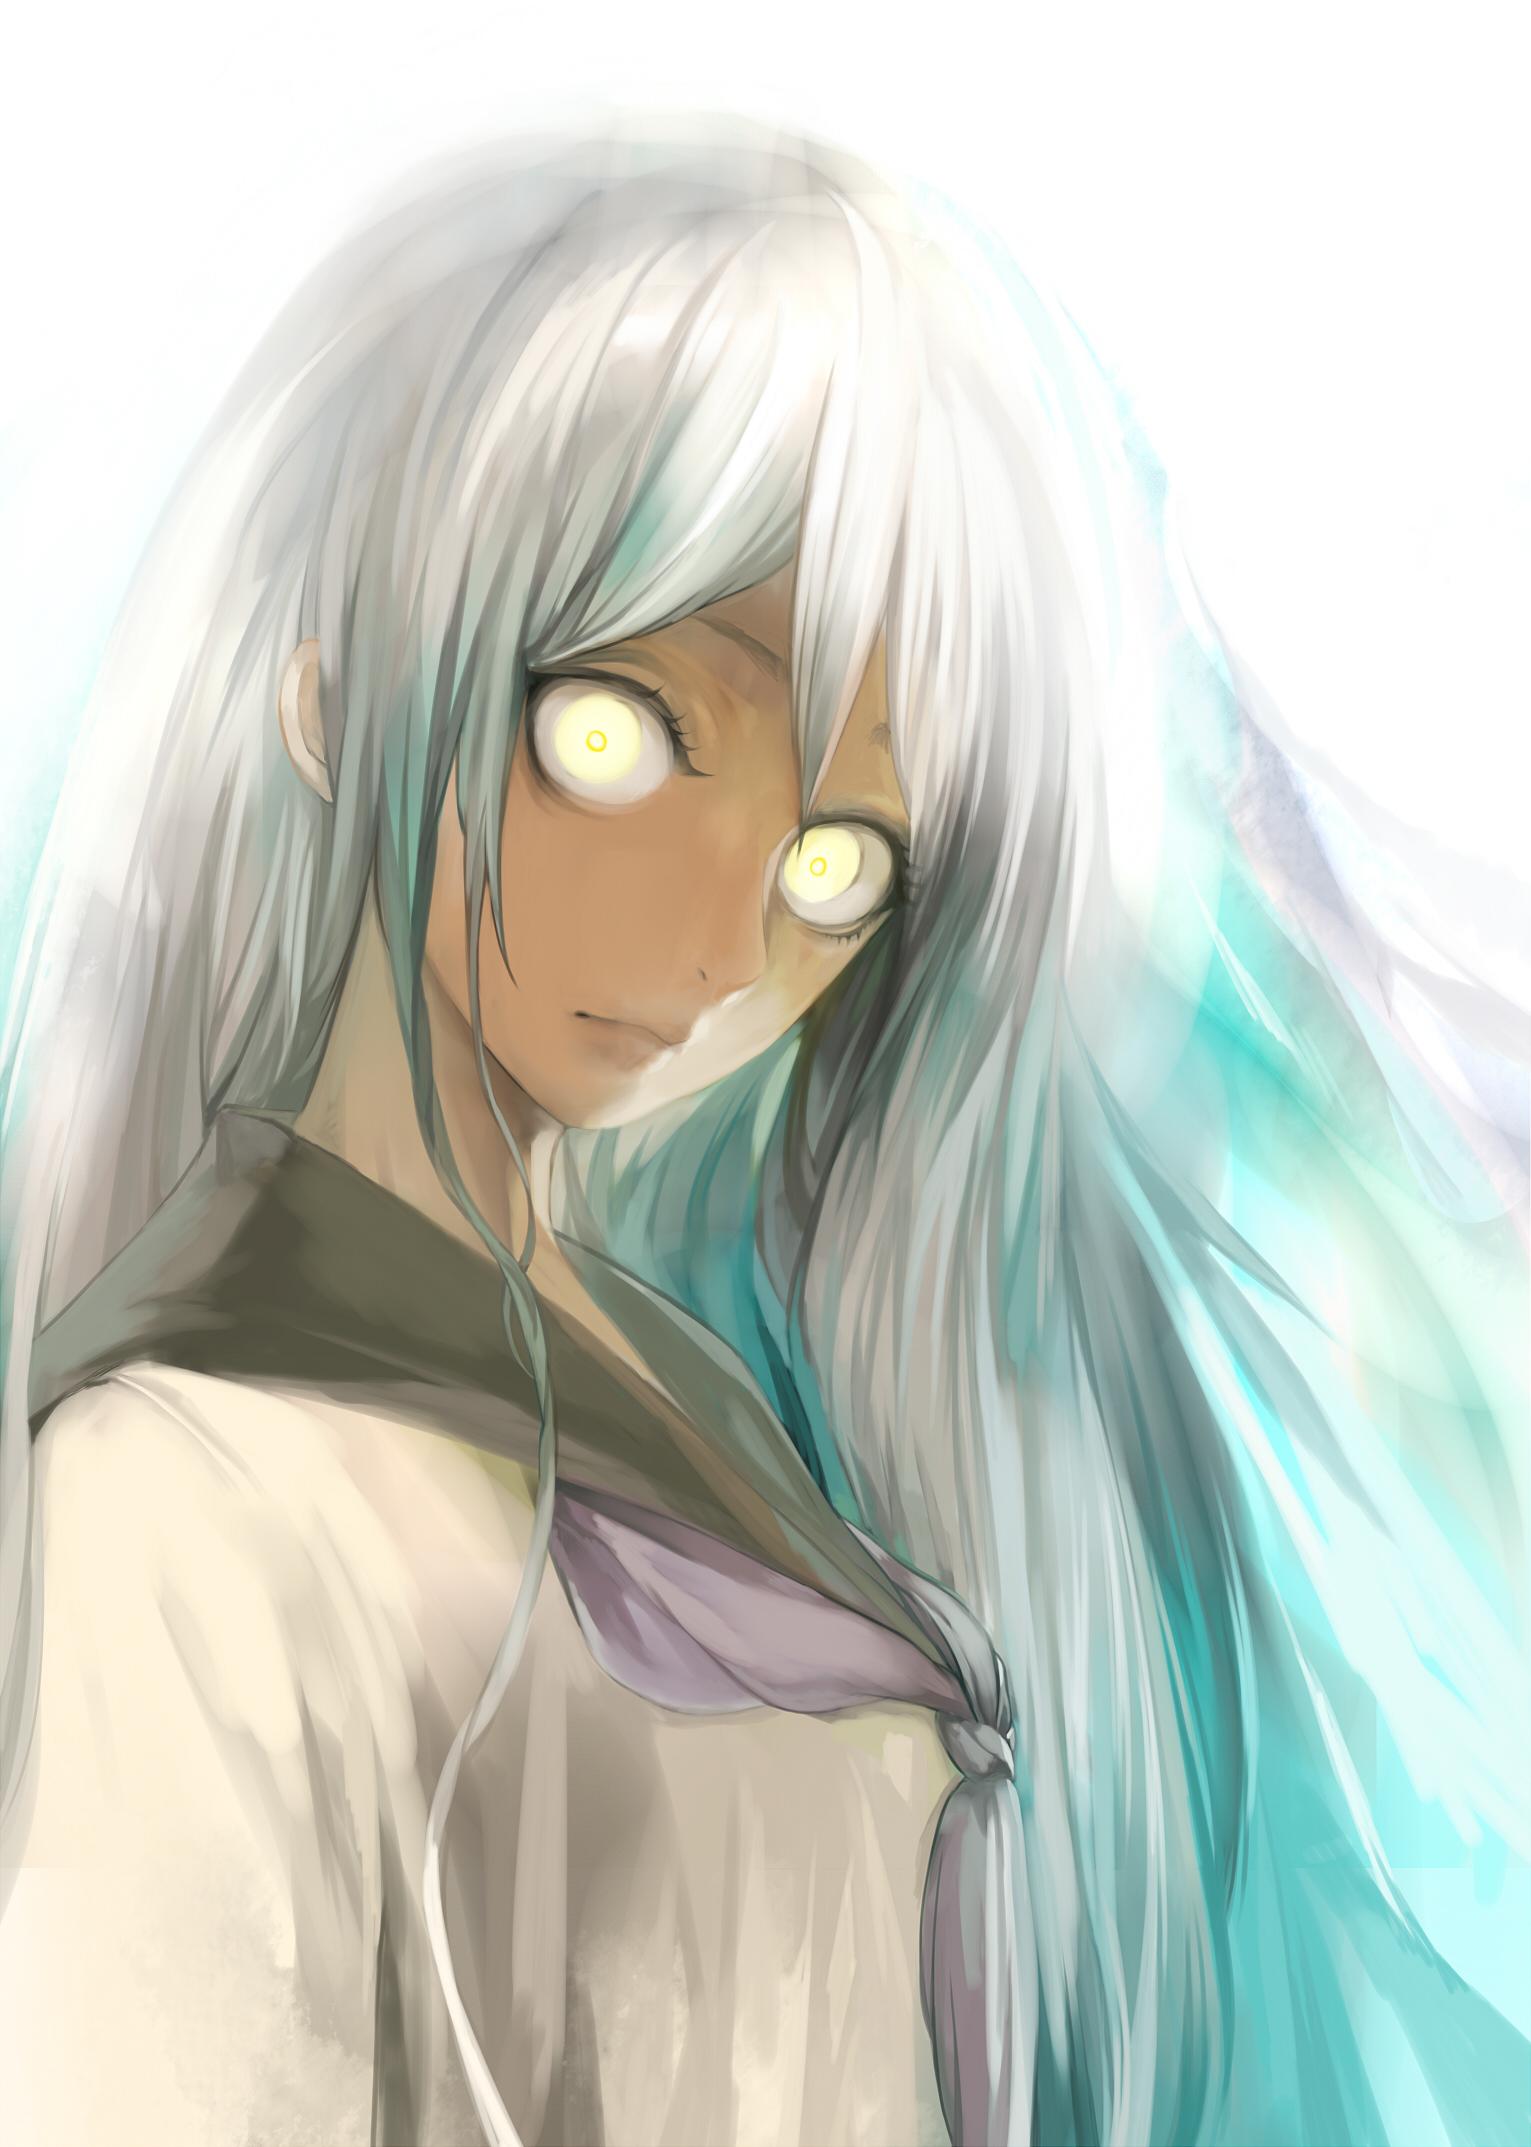 Anime girl black hair gold eyes